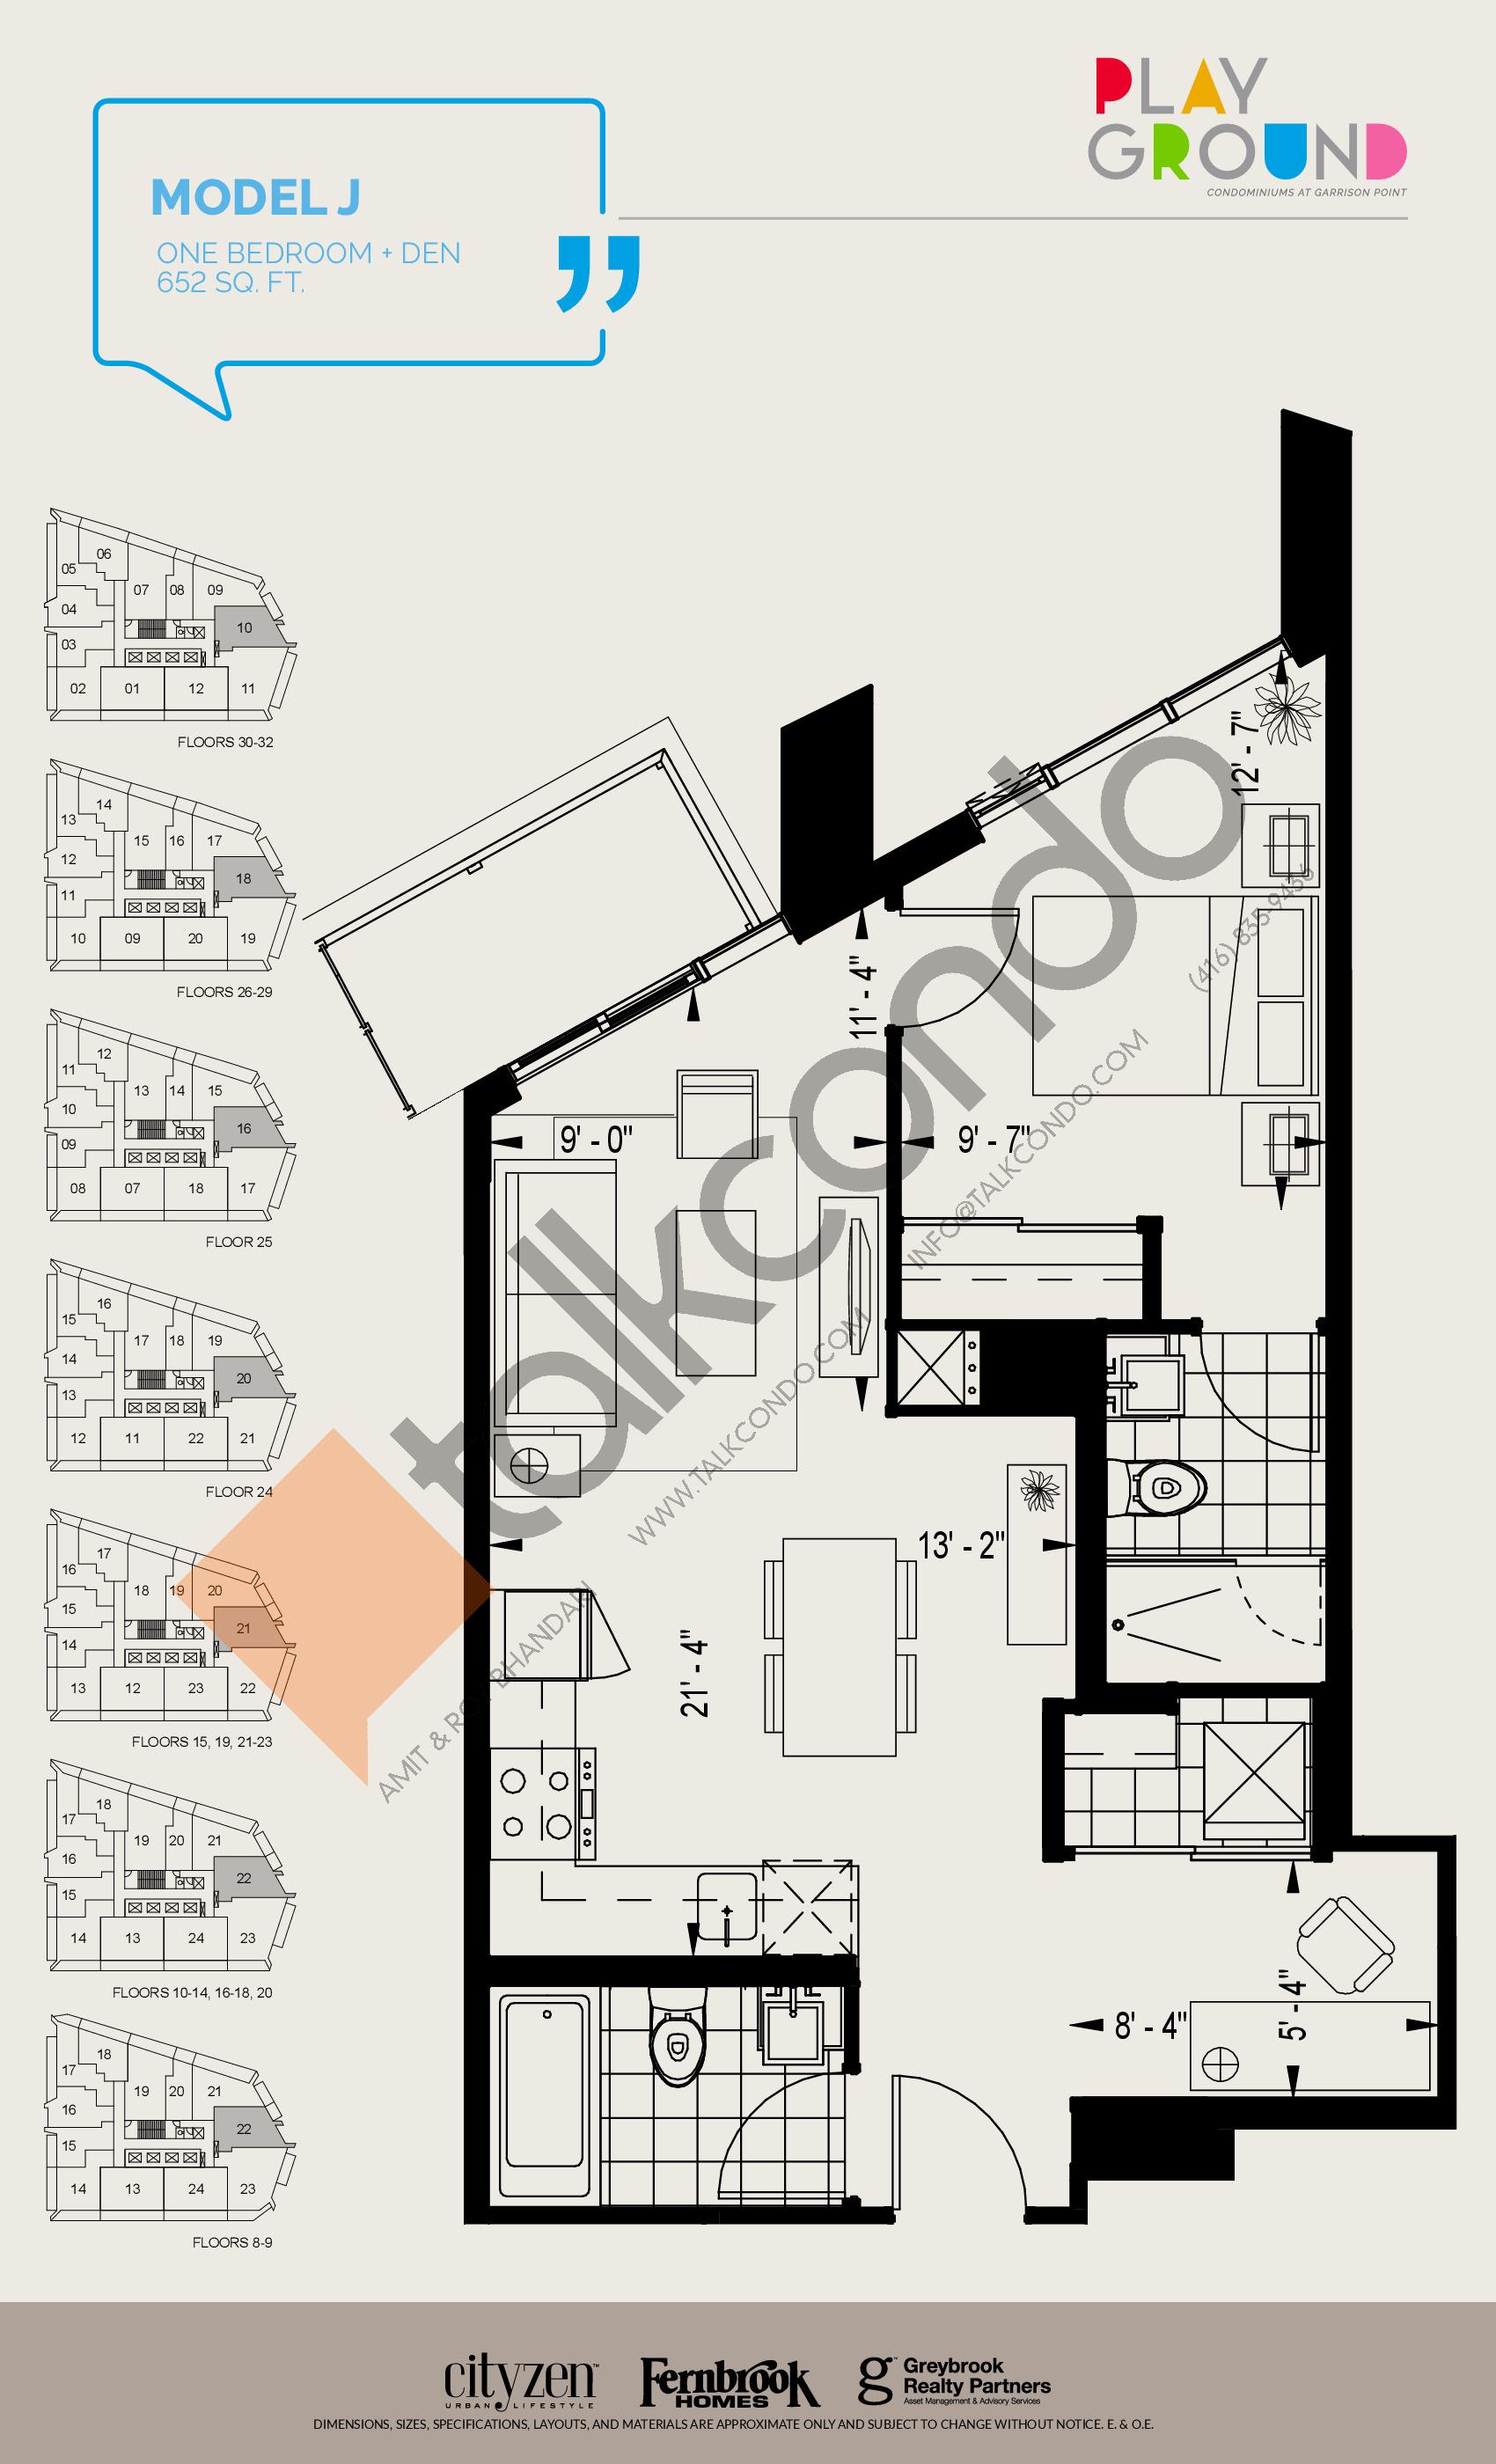 Model J Floor Plan at Playground Condos at Garrison Point - 652 sq.ft